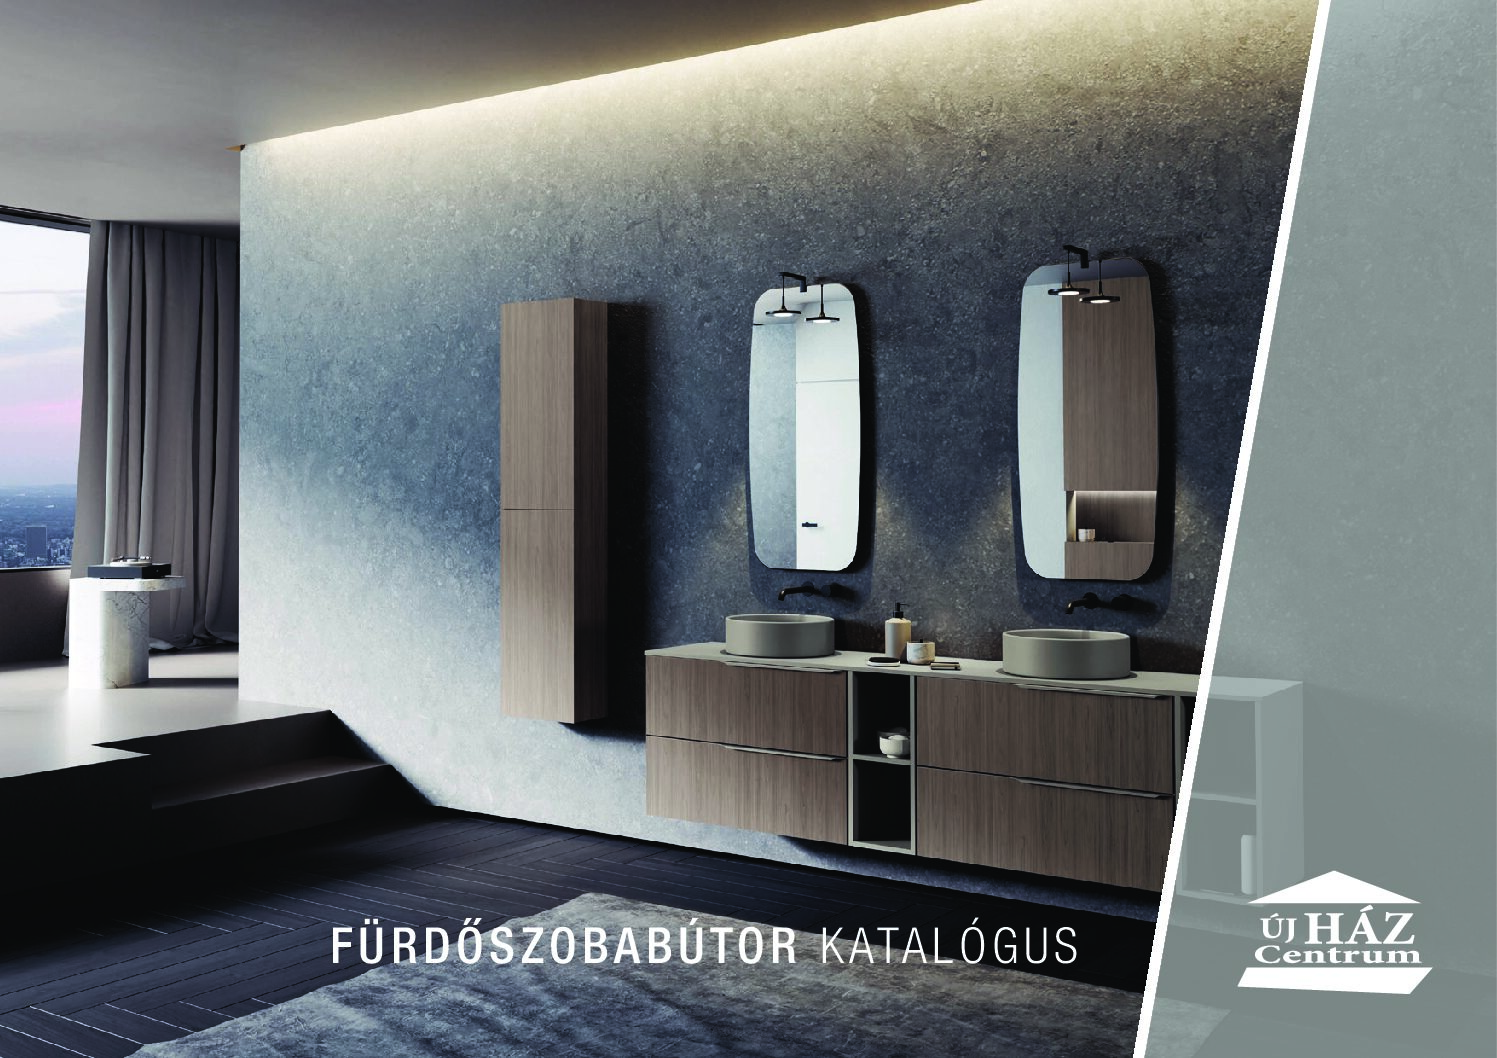 ÚH fürdőszoba bútor